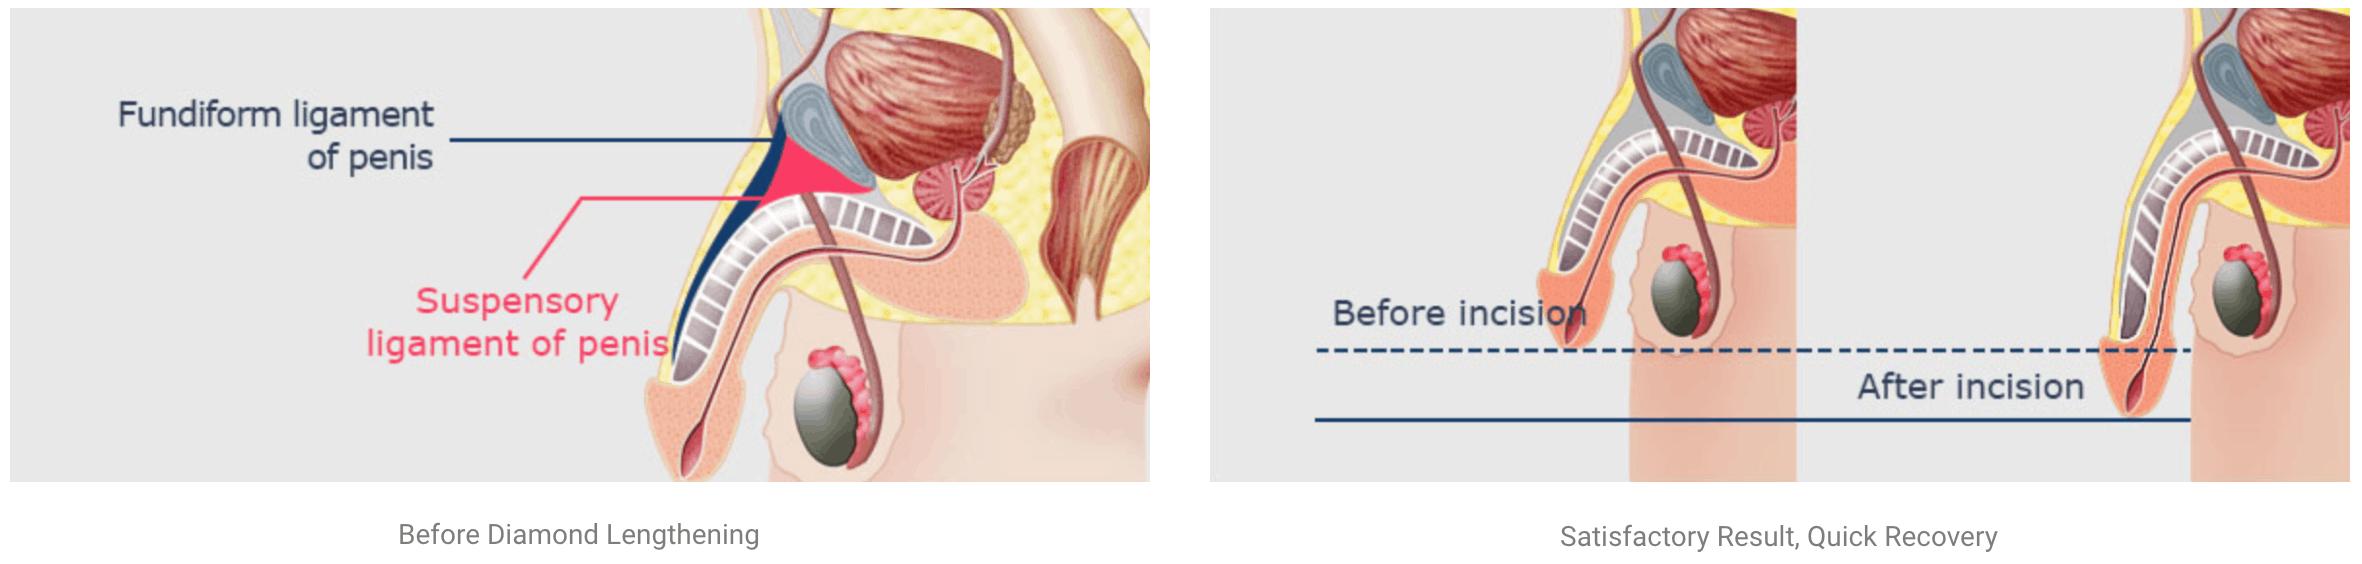 ligament cutting illustration